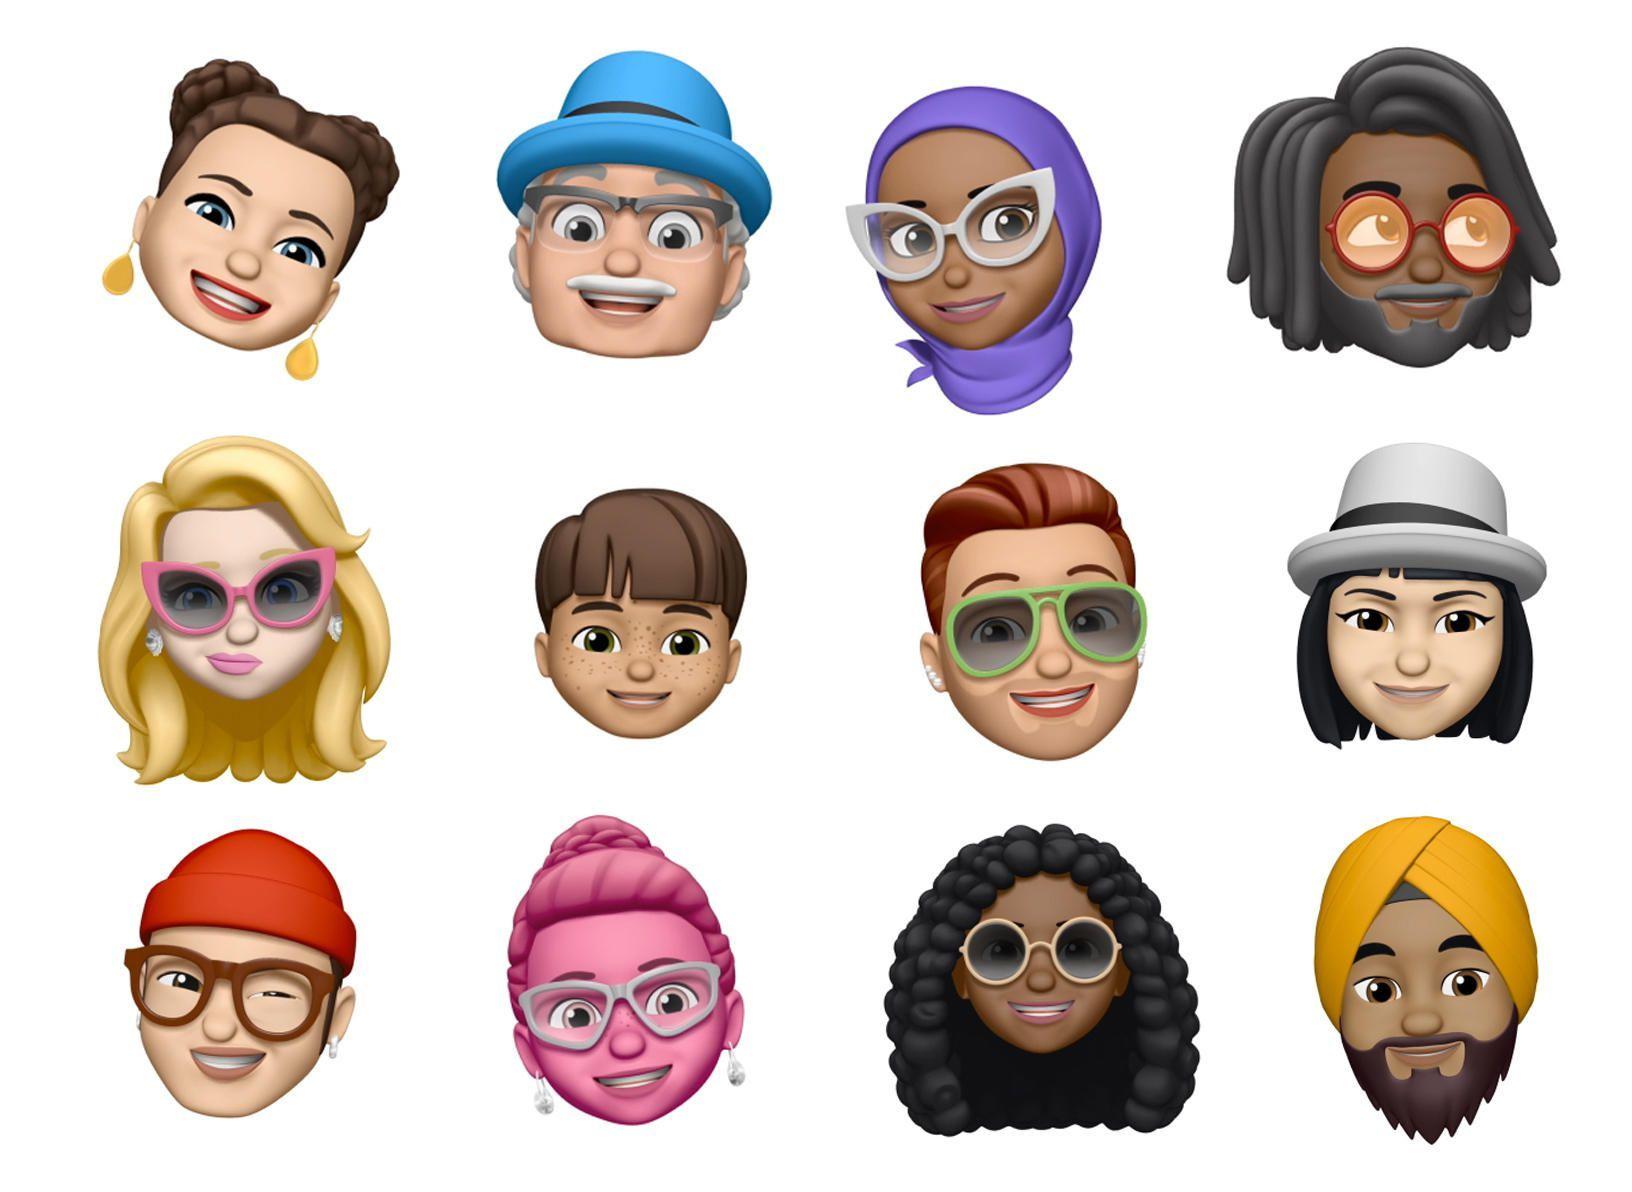 Iphone Vs Galaxy S9 Emoji Showdown New Ios Cartoon Of Yourself Emoji